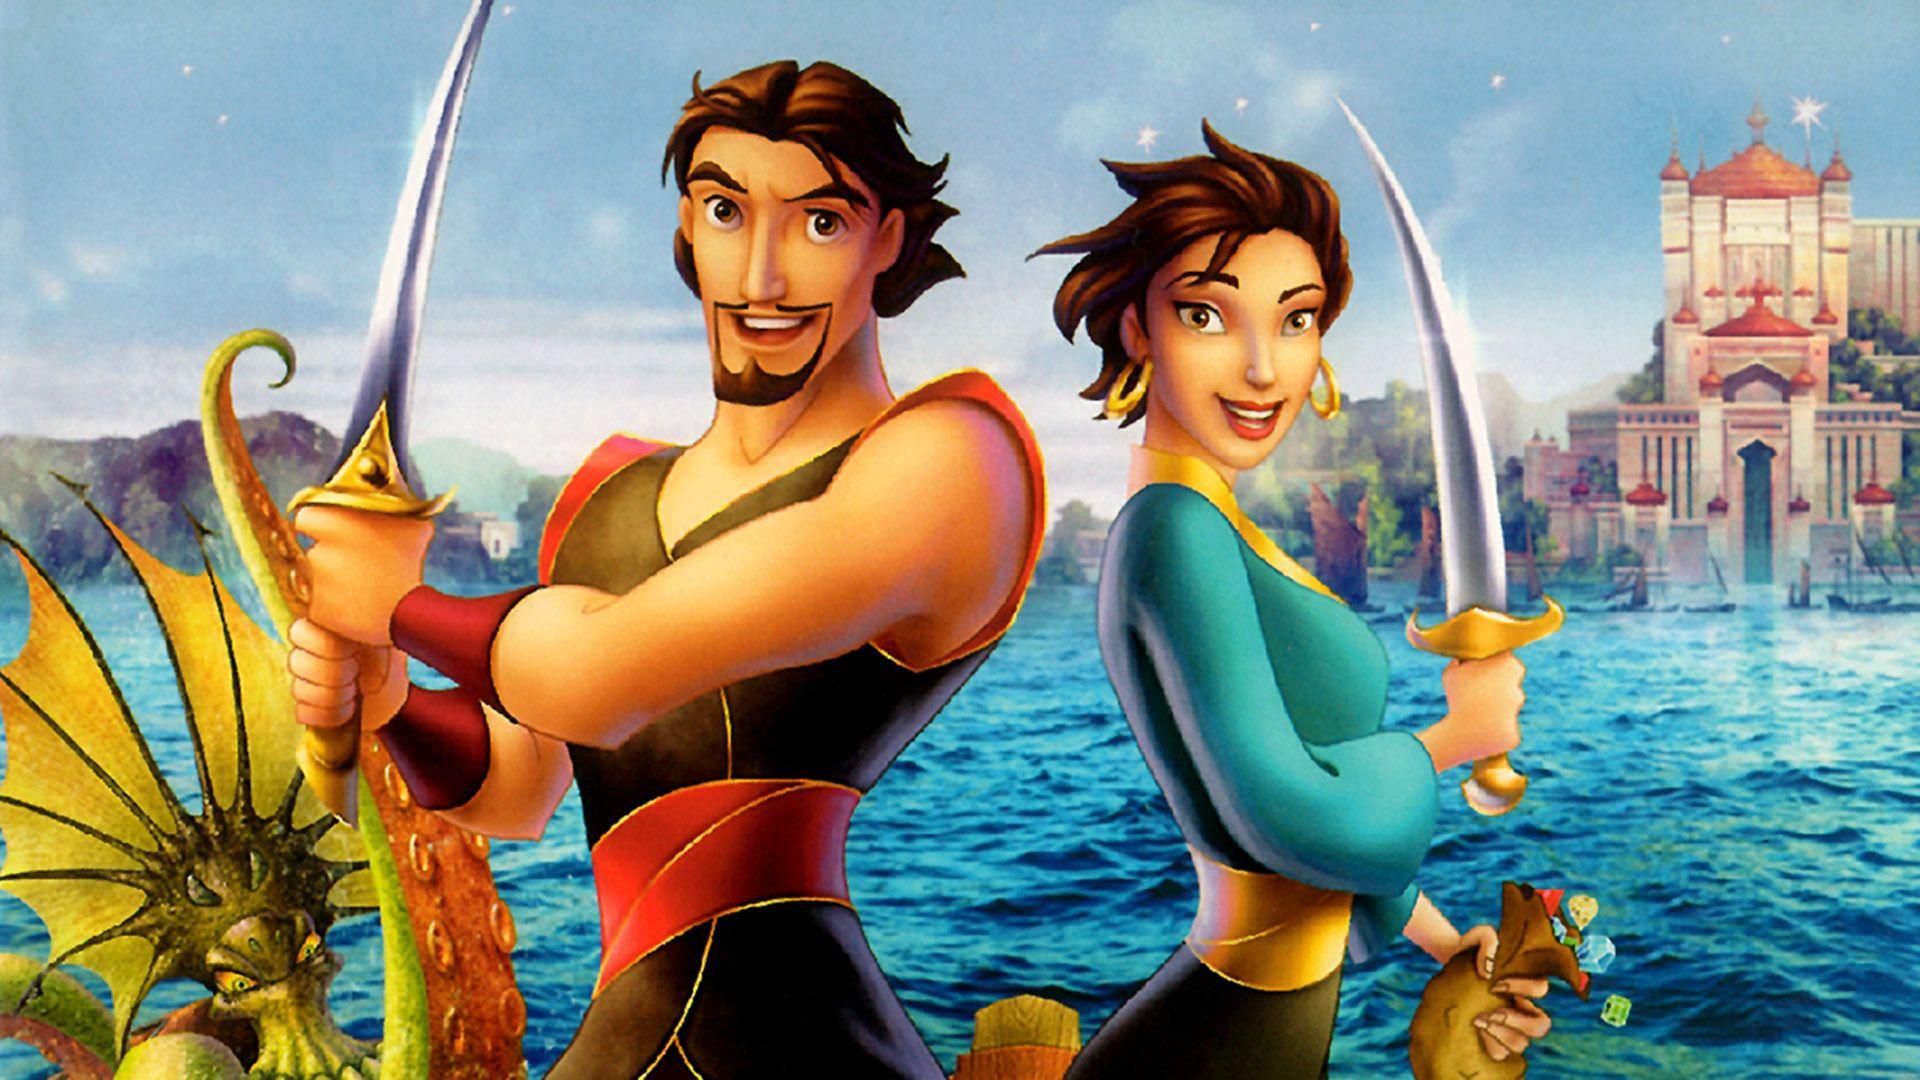 the 7 adventures of sinbad (2010) hindi dubbed